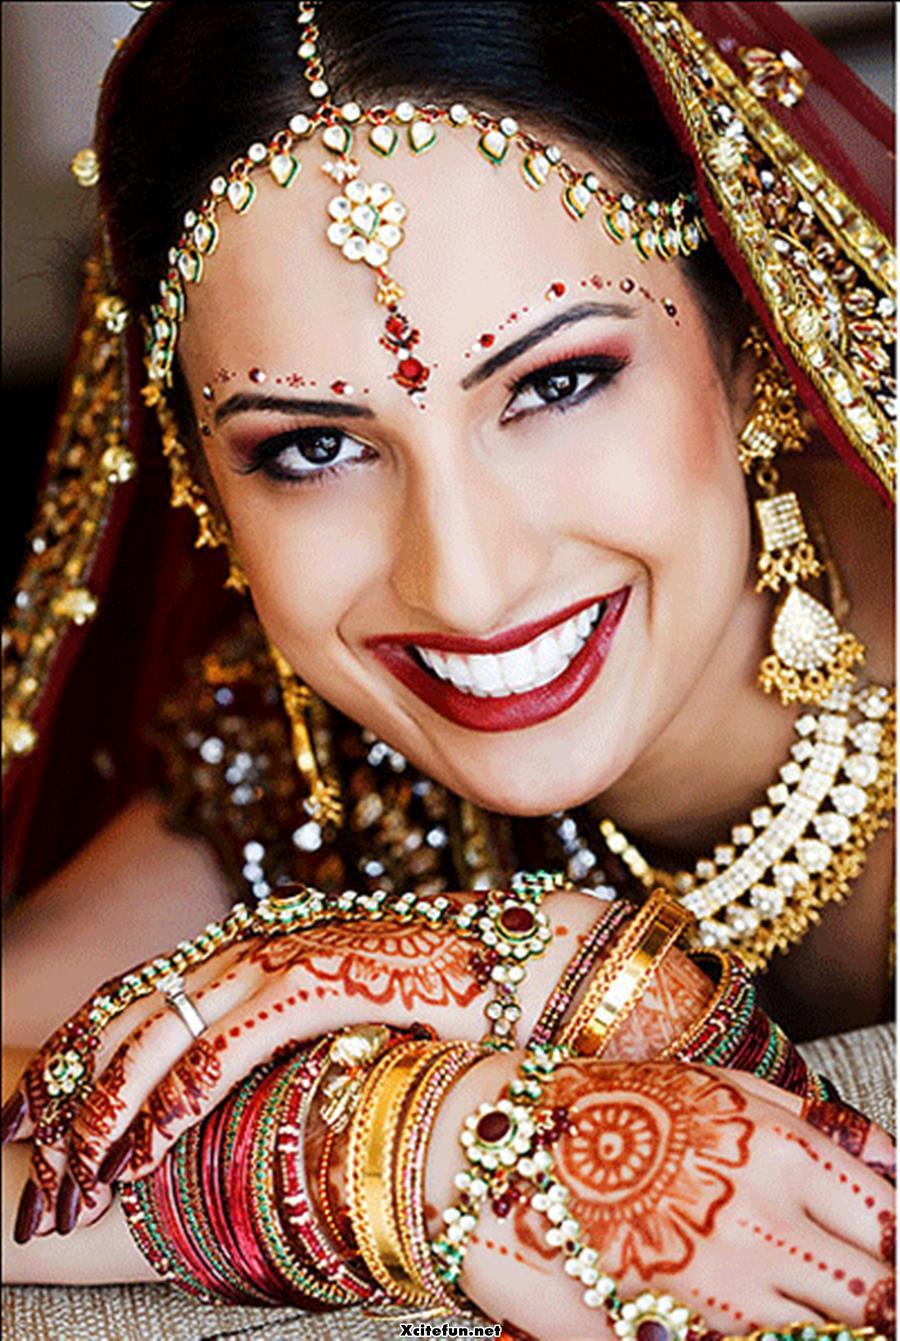 Bridal Tikka Mehndi : Bridal makeup jewelry and lehnga choli xcitefun